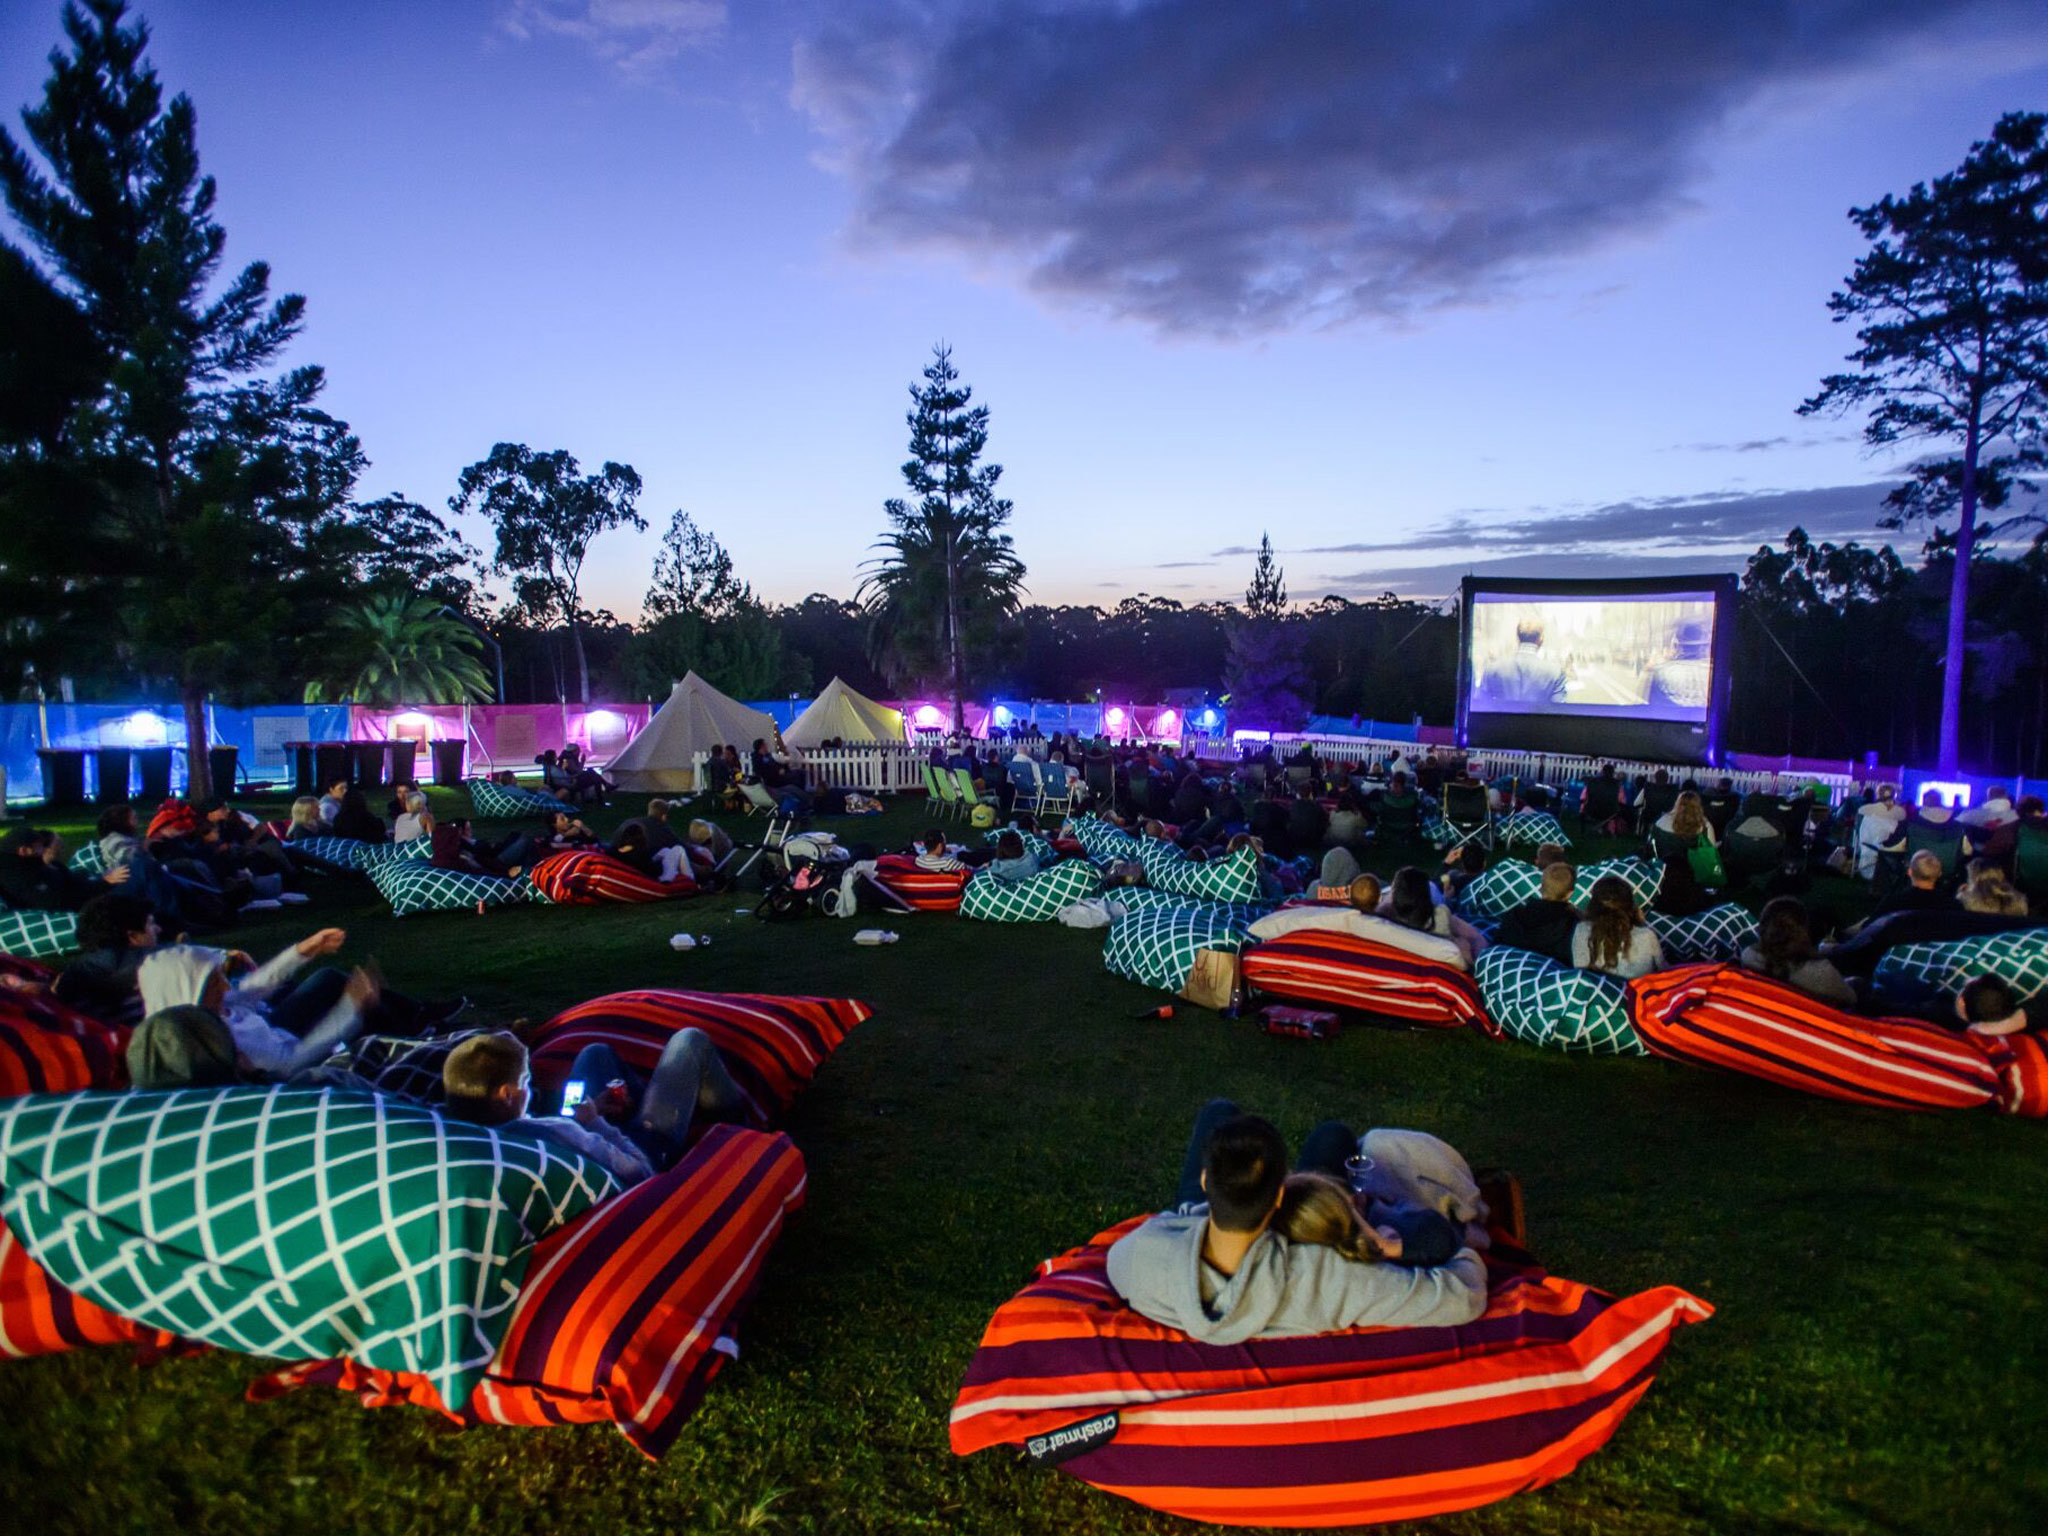 What's On Sydney   Events Calendar For Sydney Festivals, Holidays for Community Calender Sydney October 2019